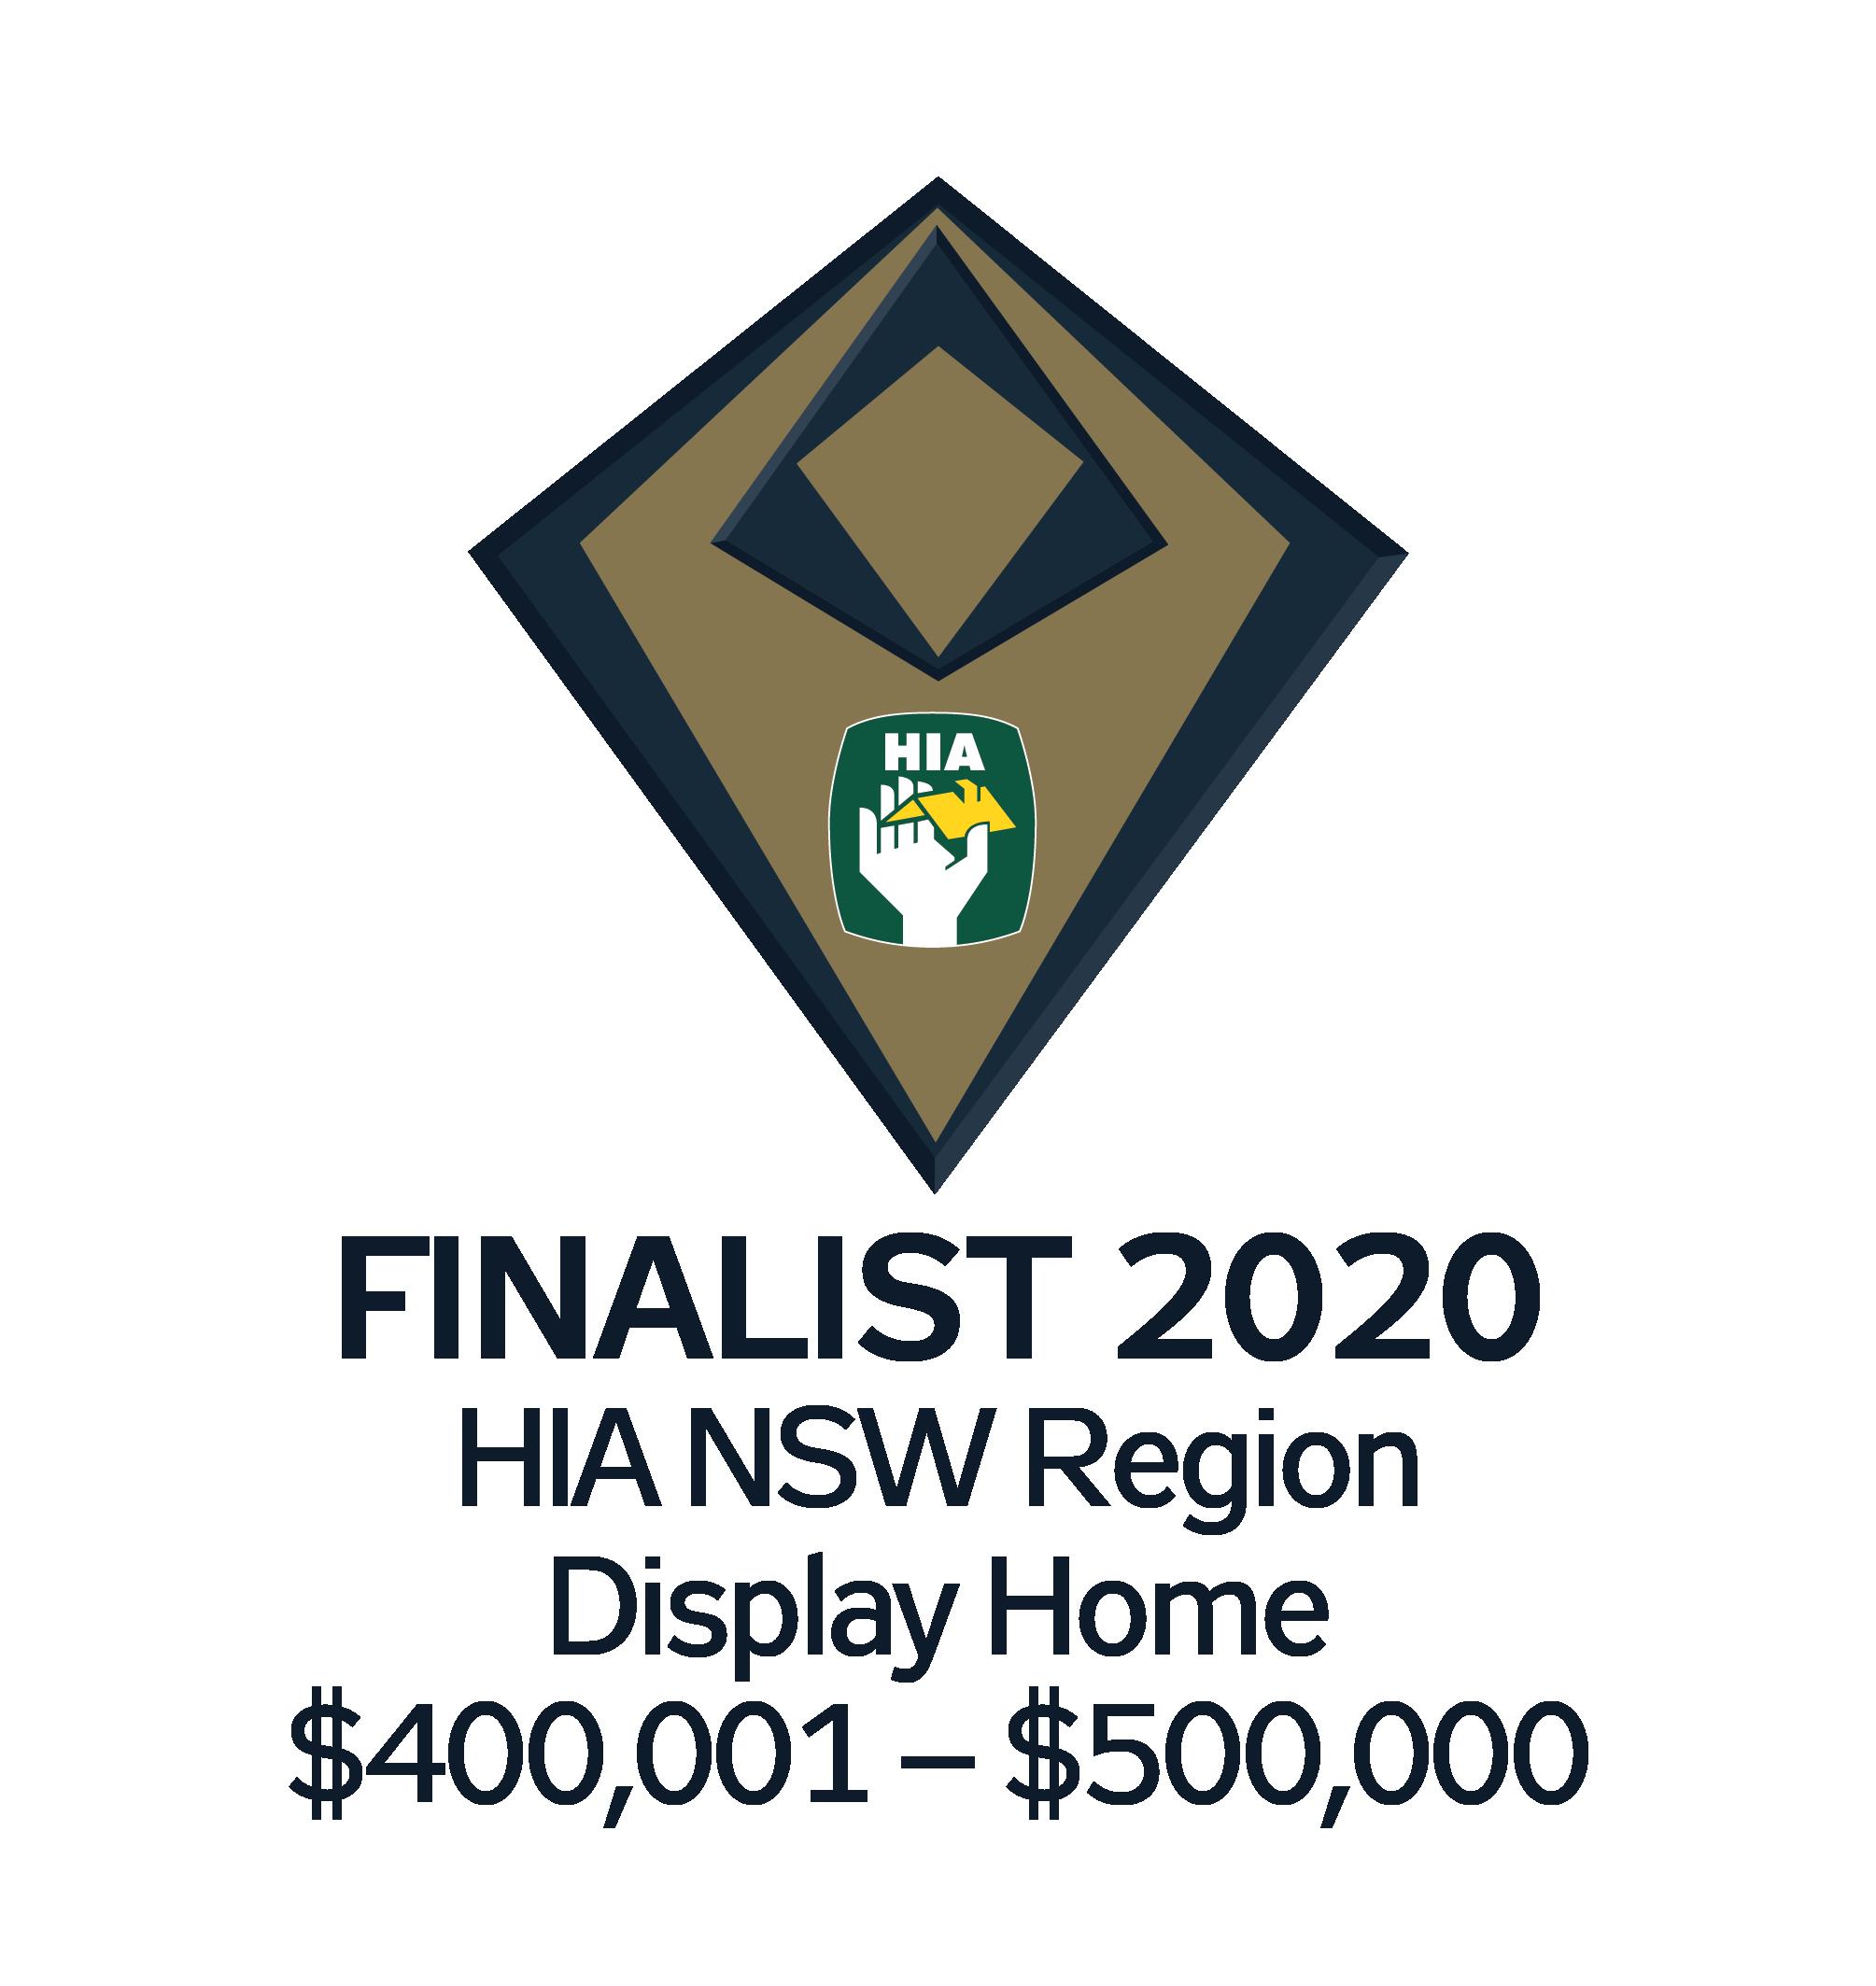 DT9120 HA2020 LOGOS_FINALISTS_NSW_DIS_400k-500k